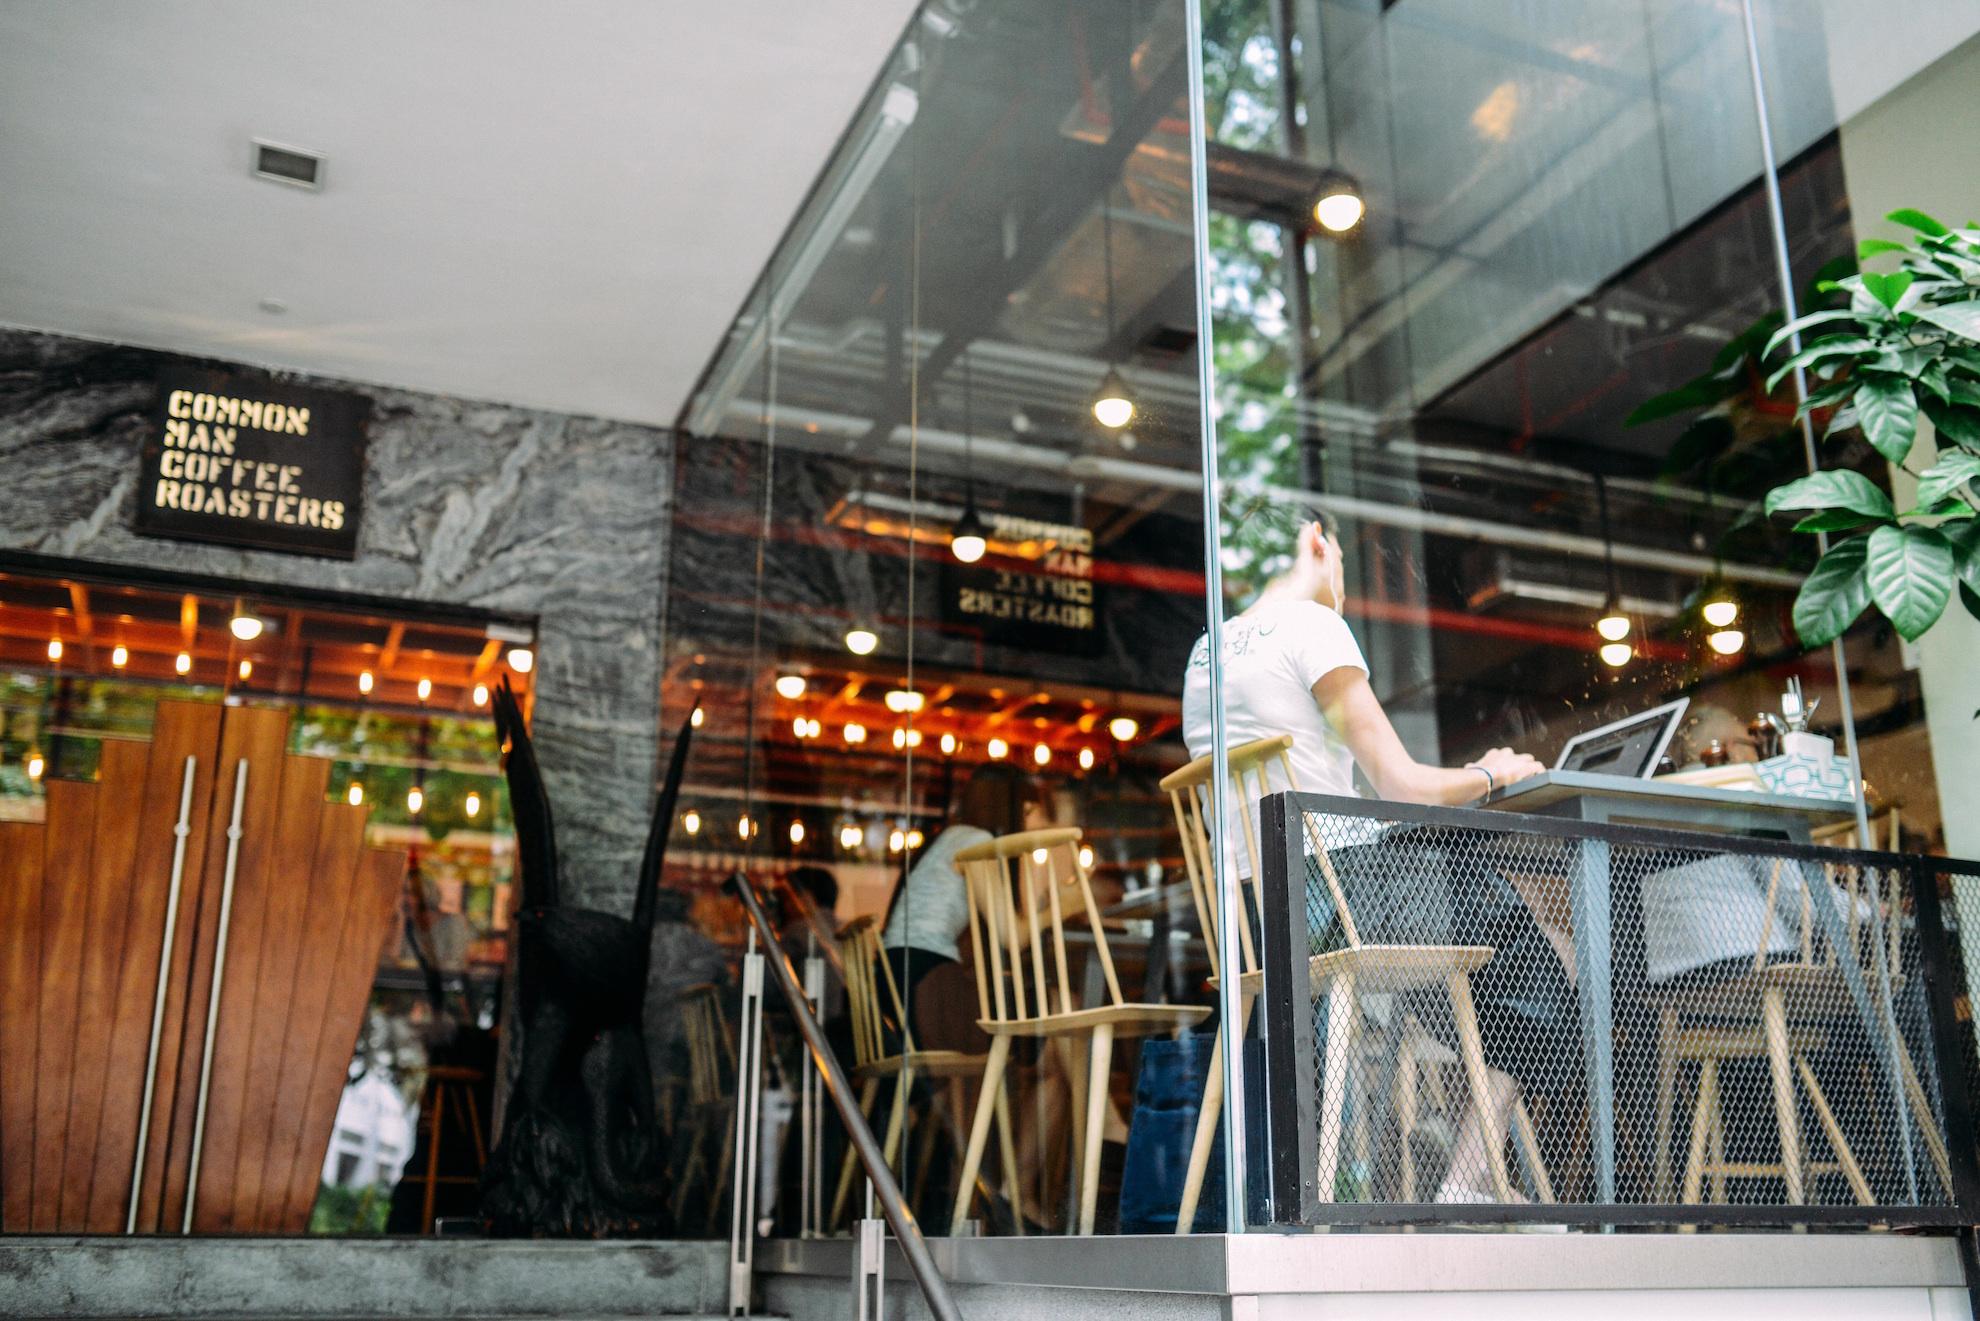 Photo: Common Man Coffee Roasters, Singapore Credit: Blake Wisz http://bit.ly/2he5p3n